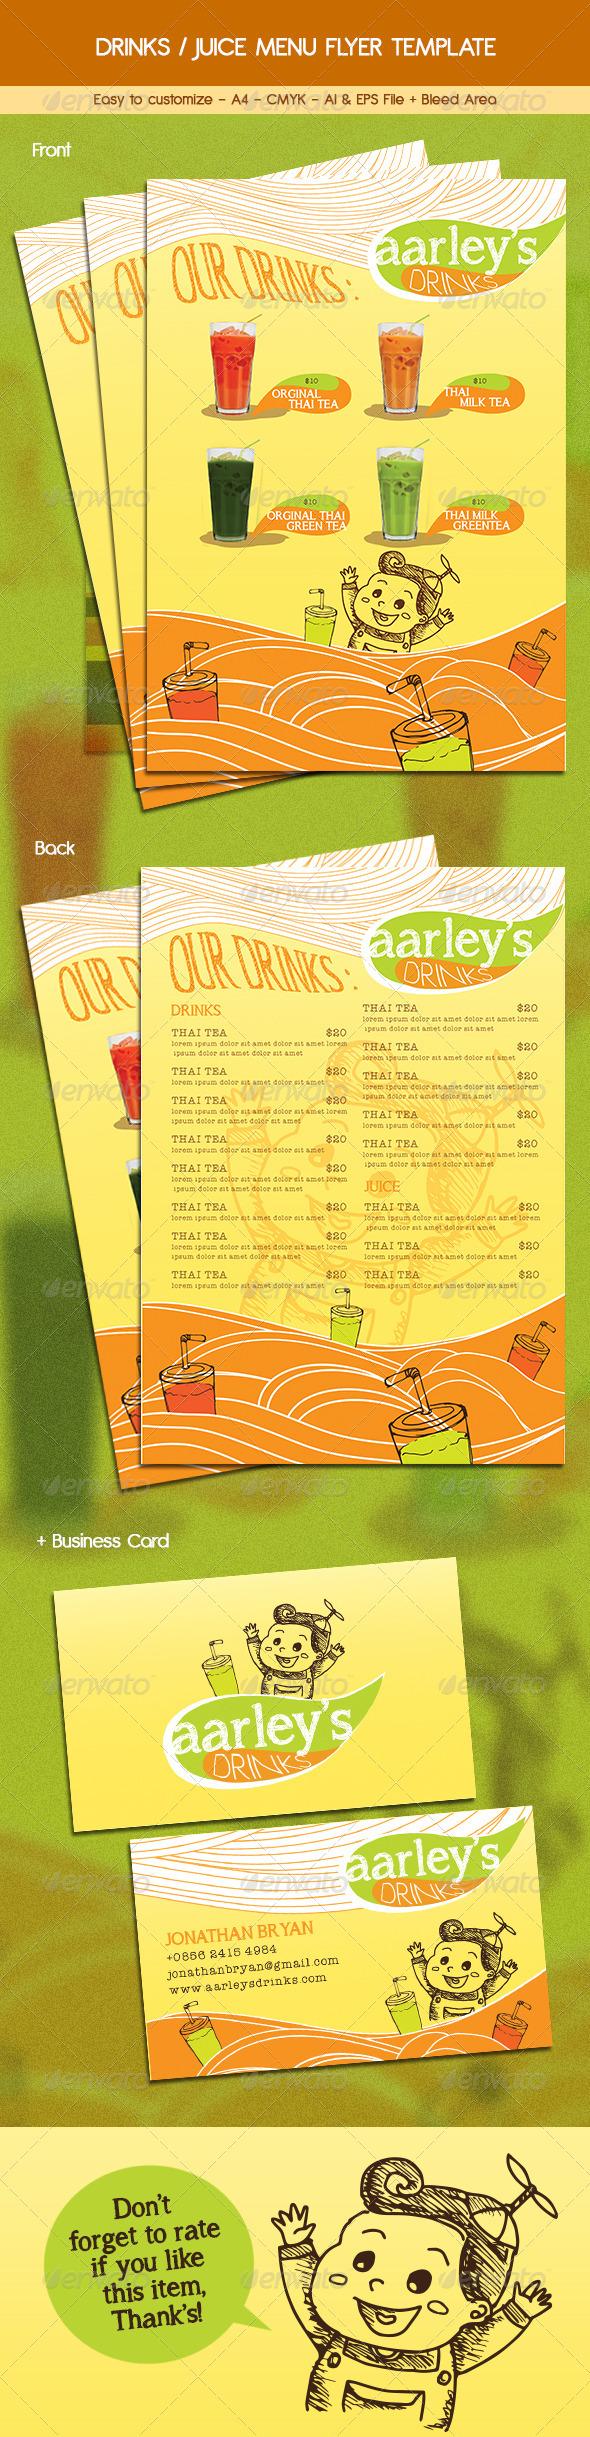 GraphicRiver Drinks Juice Menu Flyer 6455835